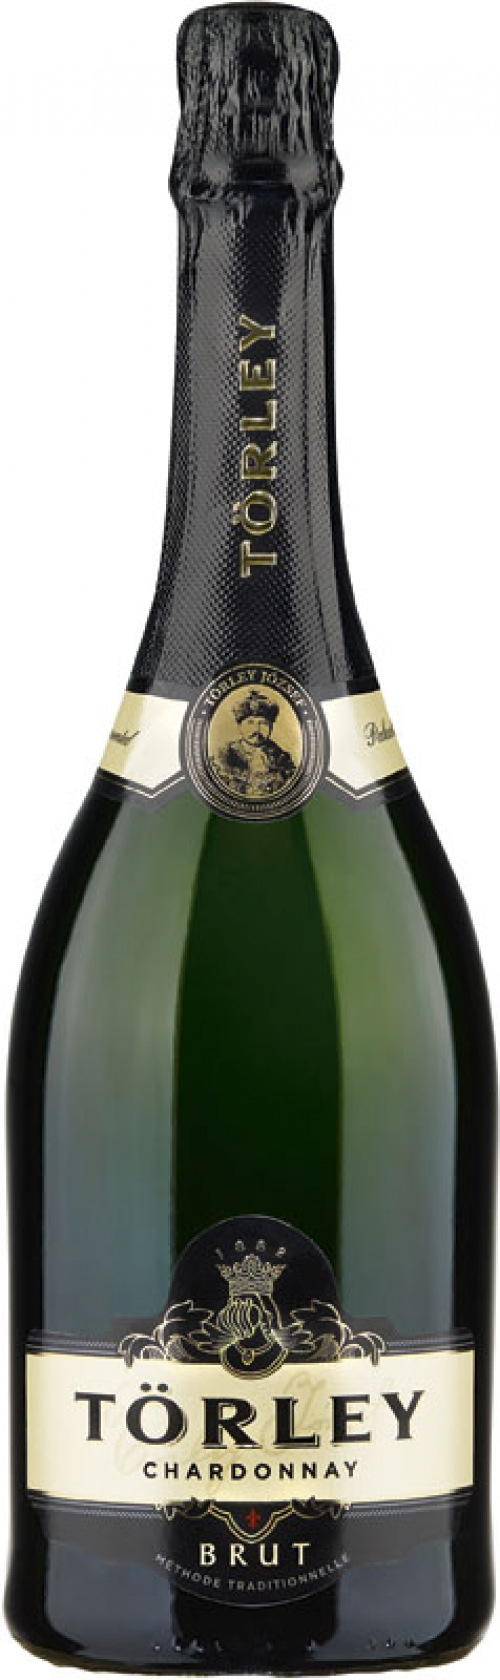 Törley Chardonnay Brut   Csapolt.hu